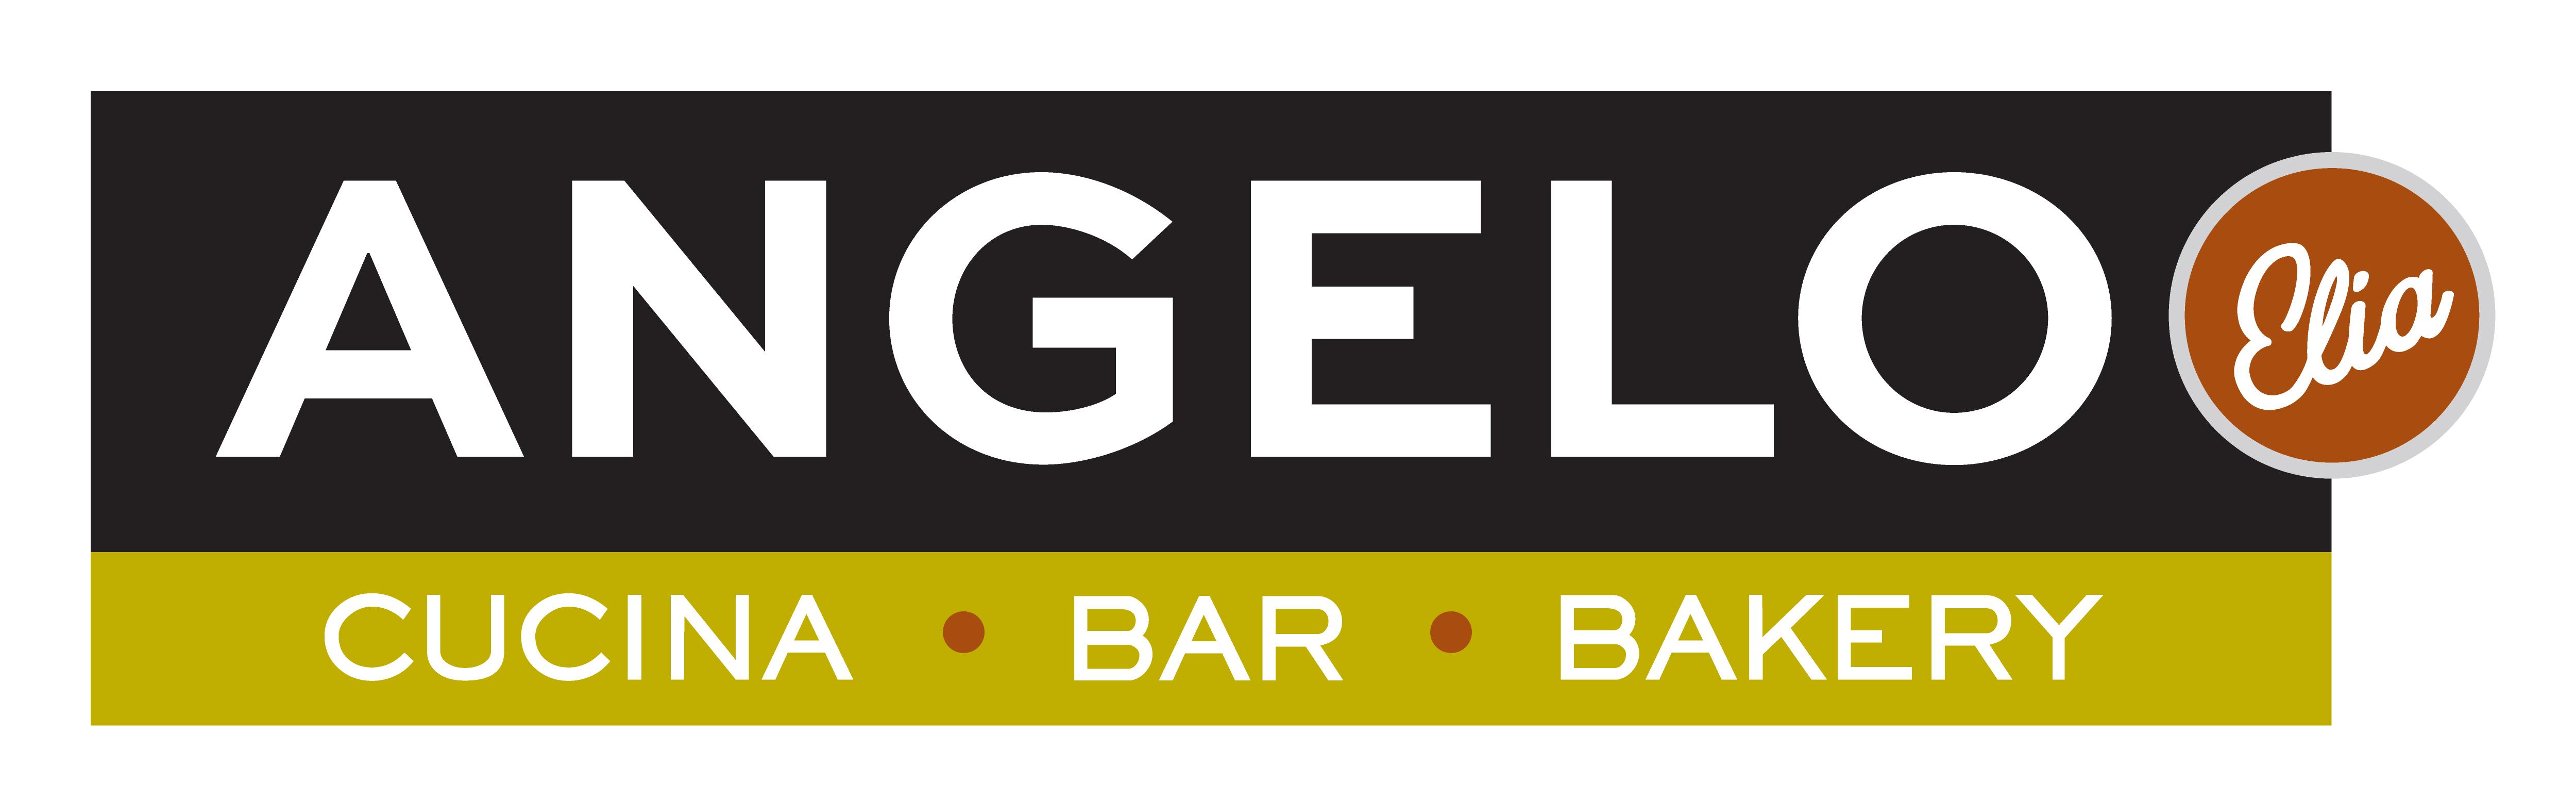 Best of Doral™ presents Angelo Elia restaurant. A Doral Chamber of Commerce member.